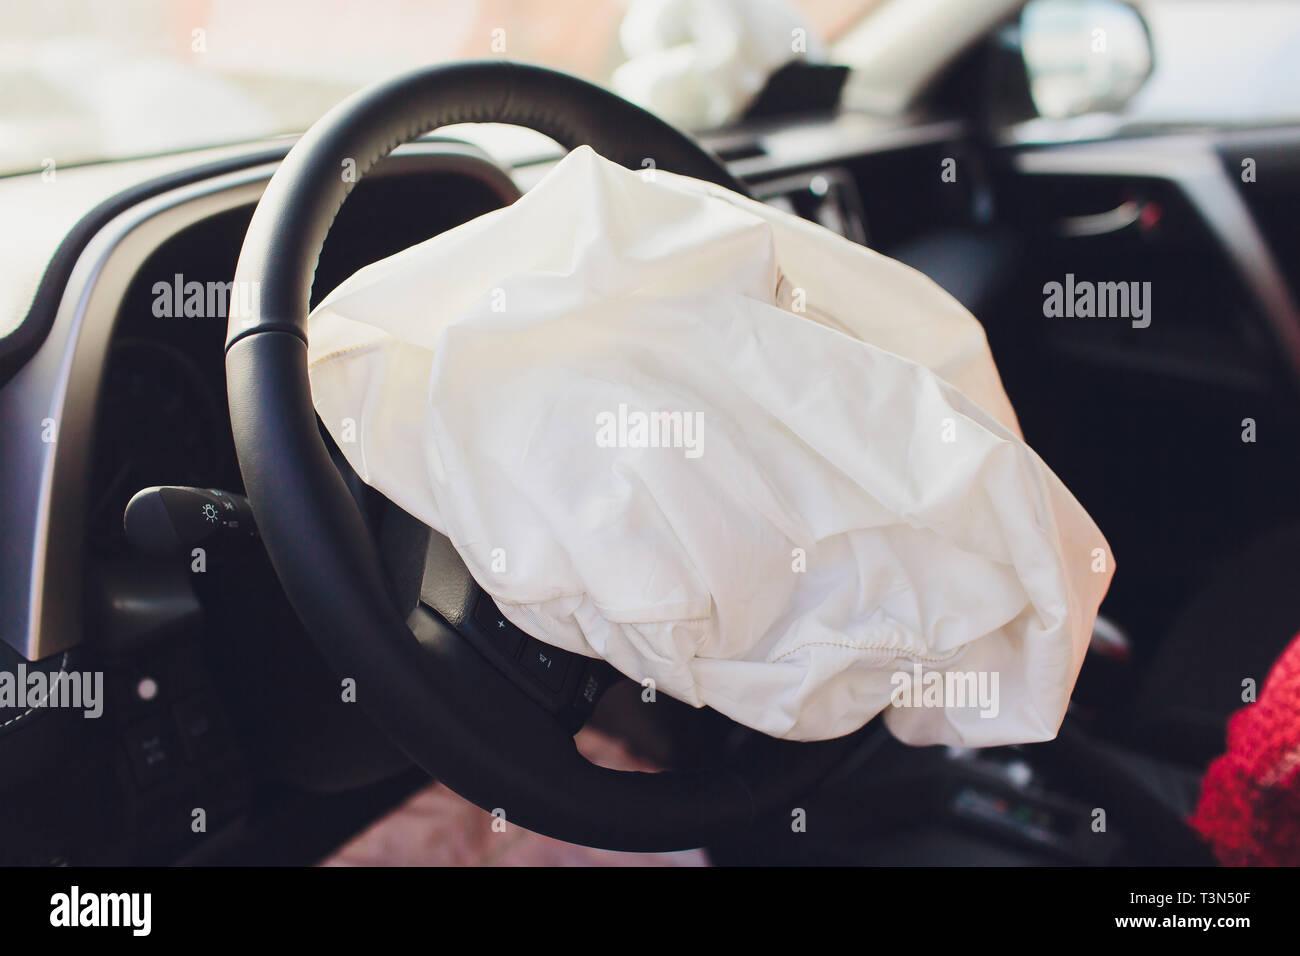 Deployed Airbag Crash Stock Photos & Deployed Airbag Crash